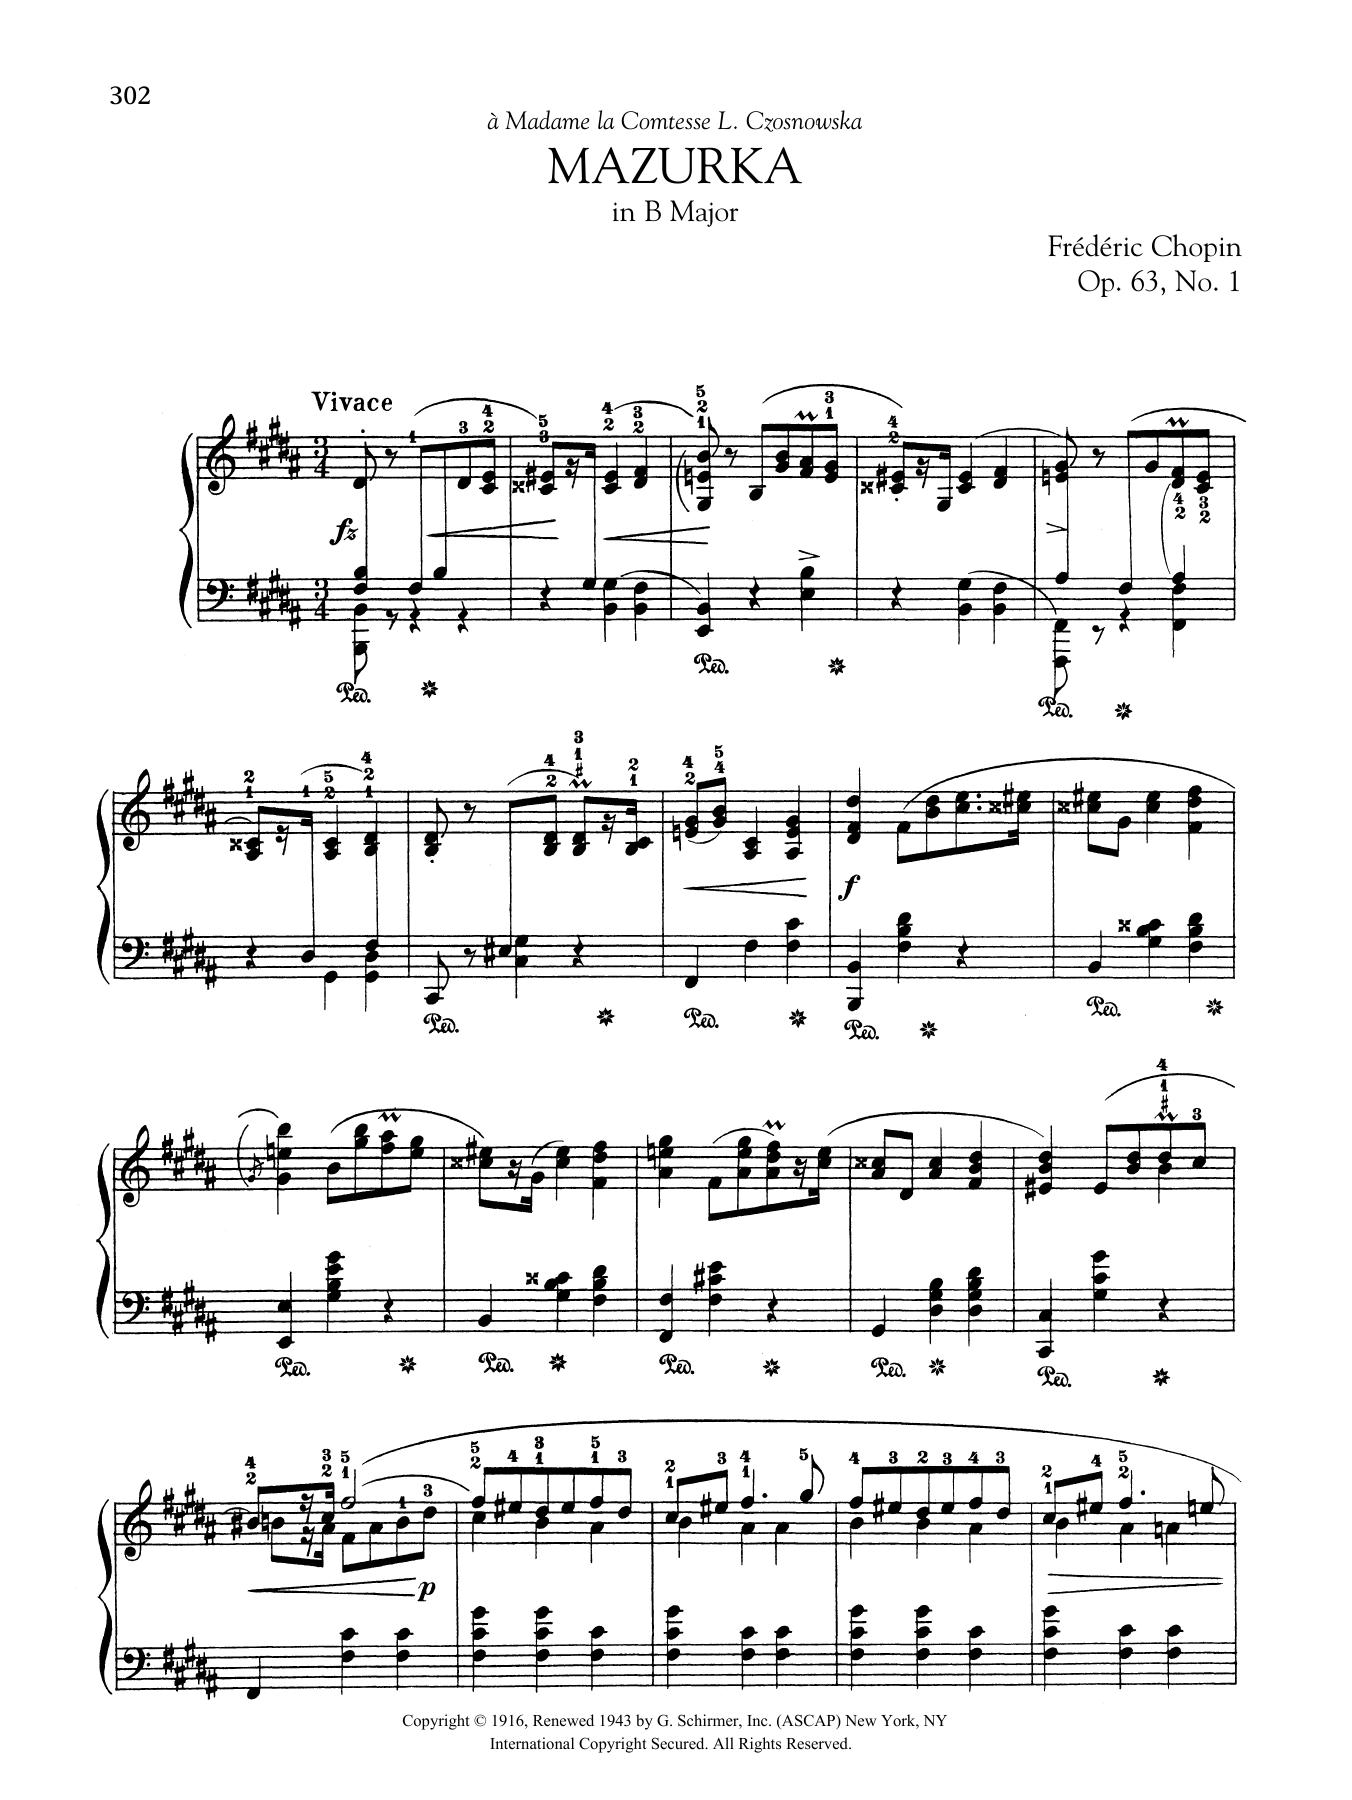 Mazurka in B Major, Op. 63, No. 1 Sheet Music